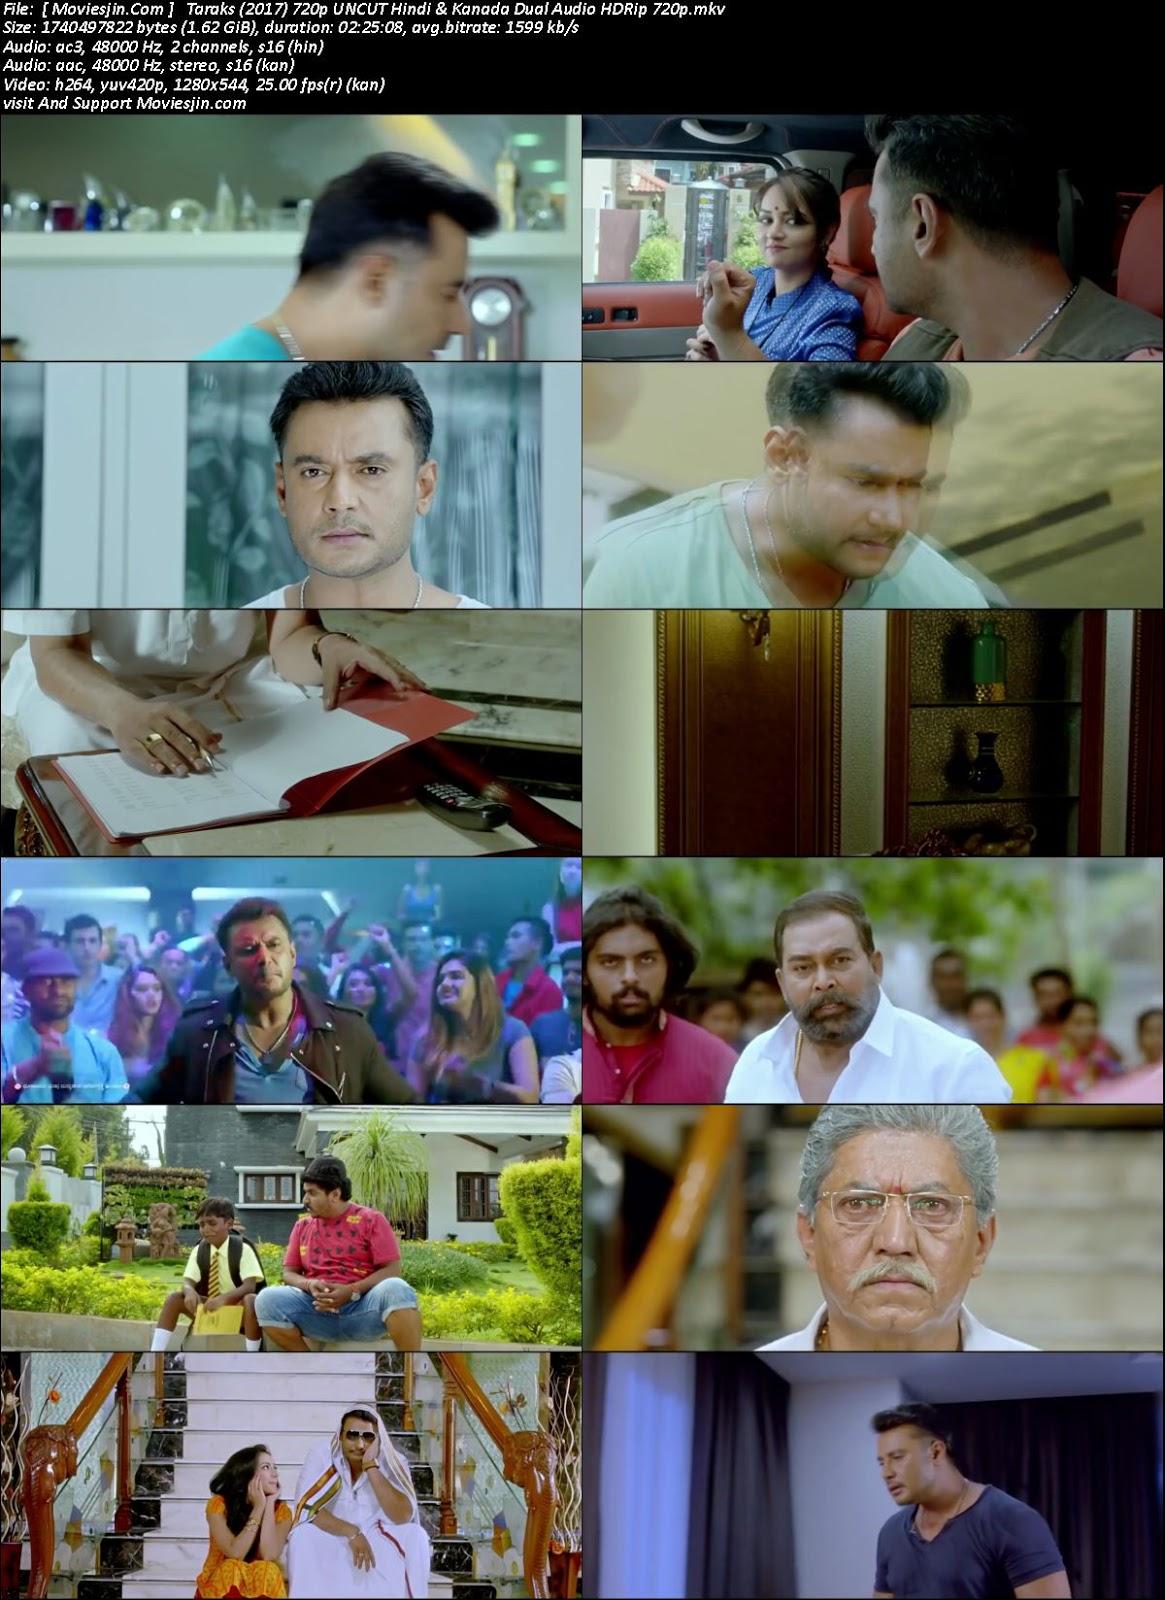 Watch Online Tarak 2017 HDRip Hindi Dual Audio UnCut 720p Esubs Full Movie Download Khatrimaza, free download 9xmovies,